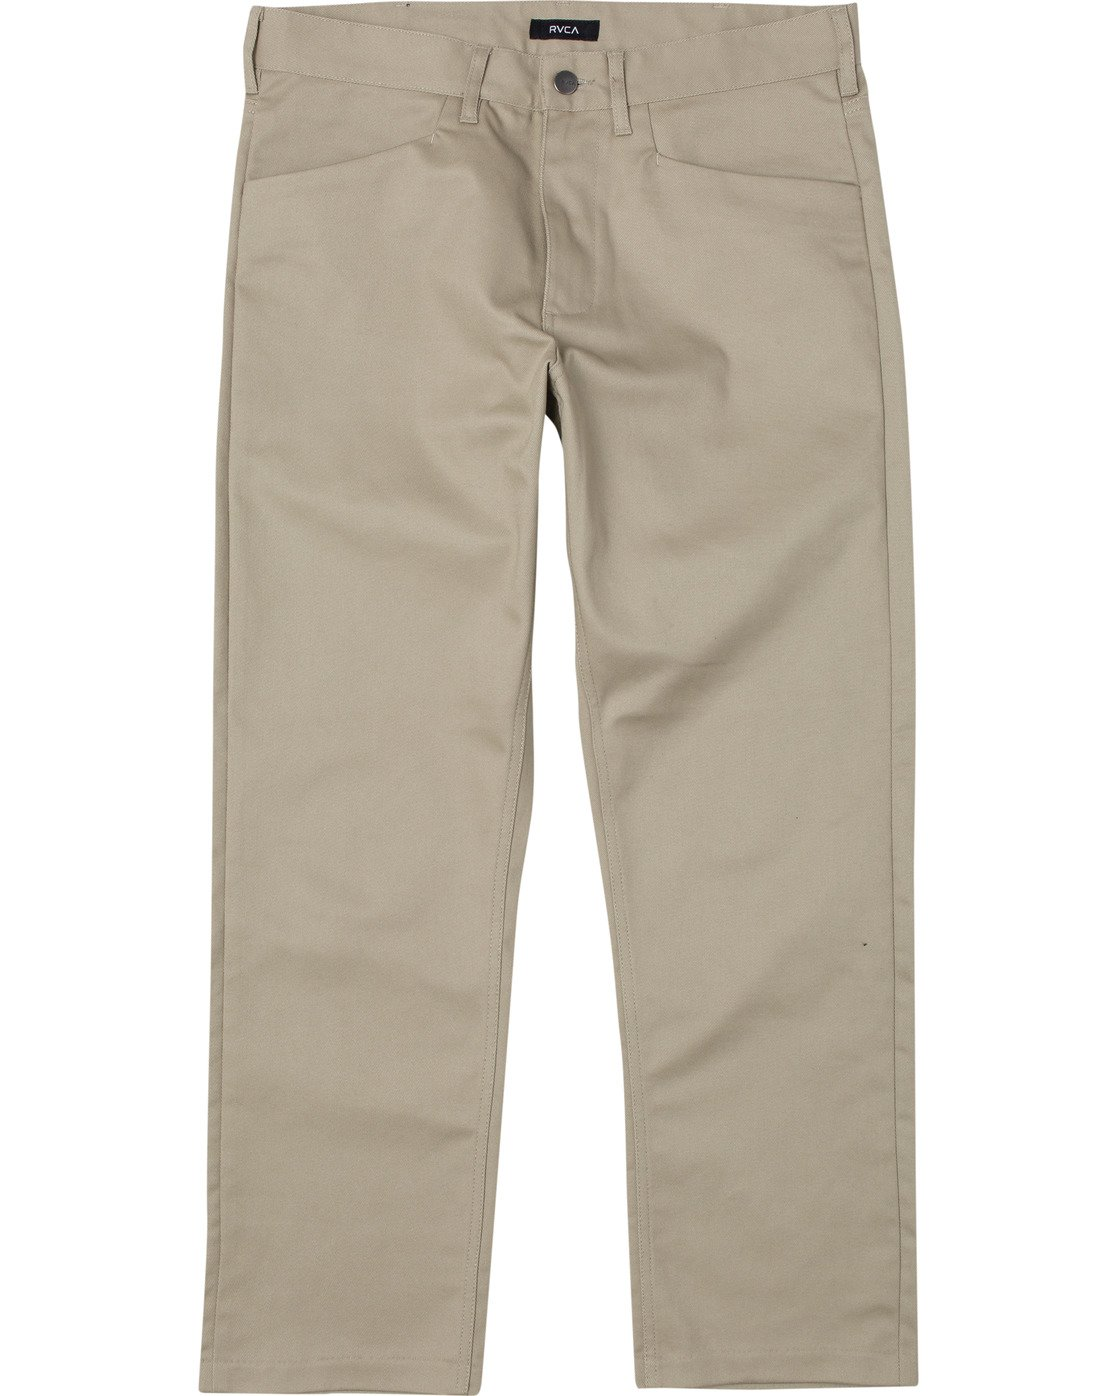 0 New Dawn Pressed - Trousers for Men Green U1PTRHRVF0 RVCA